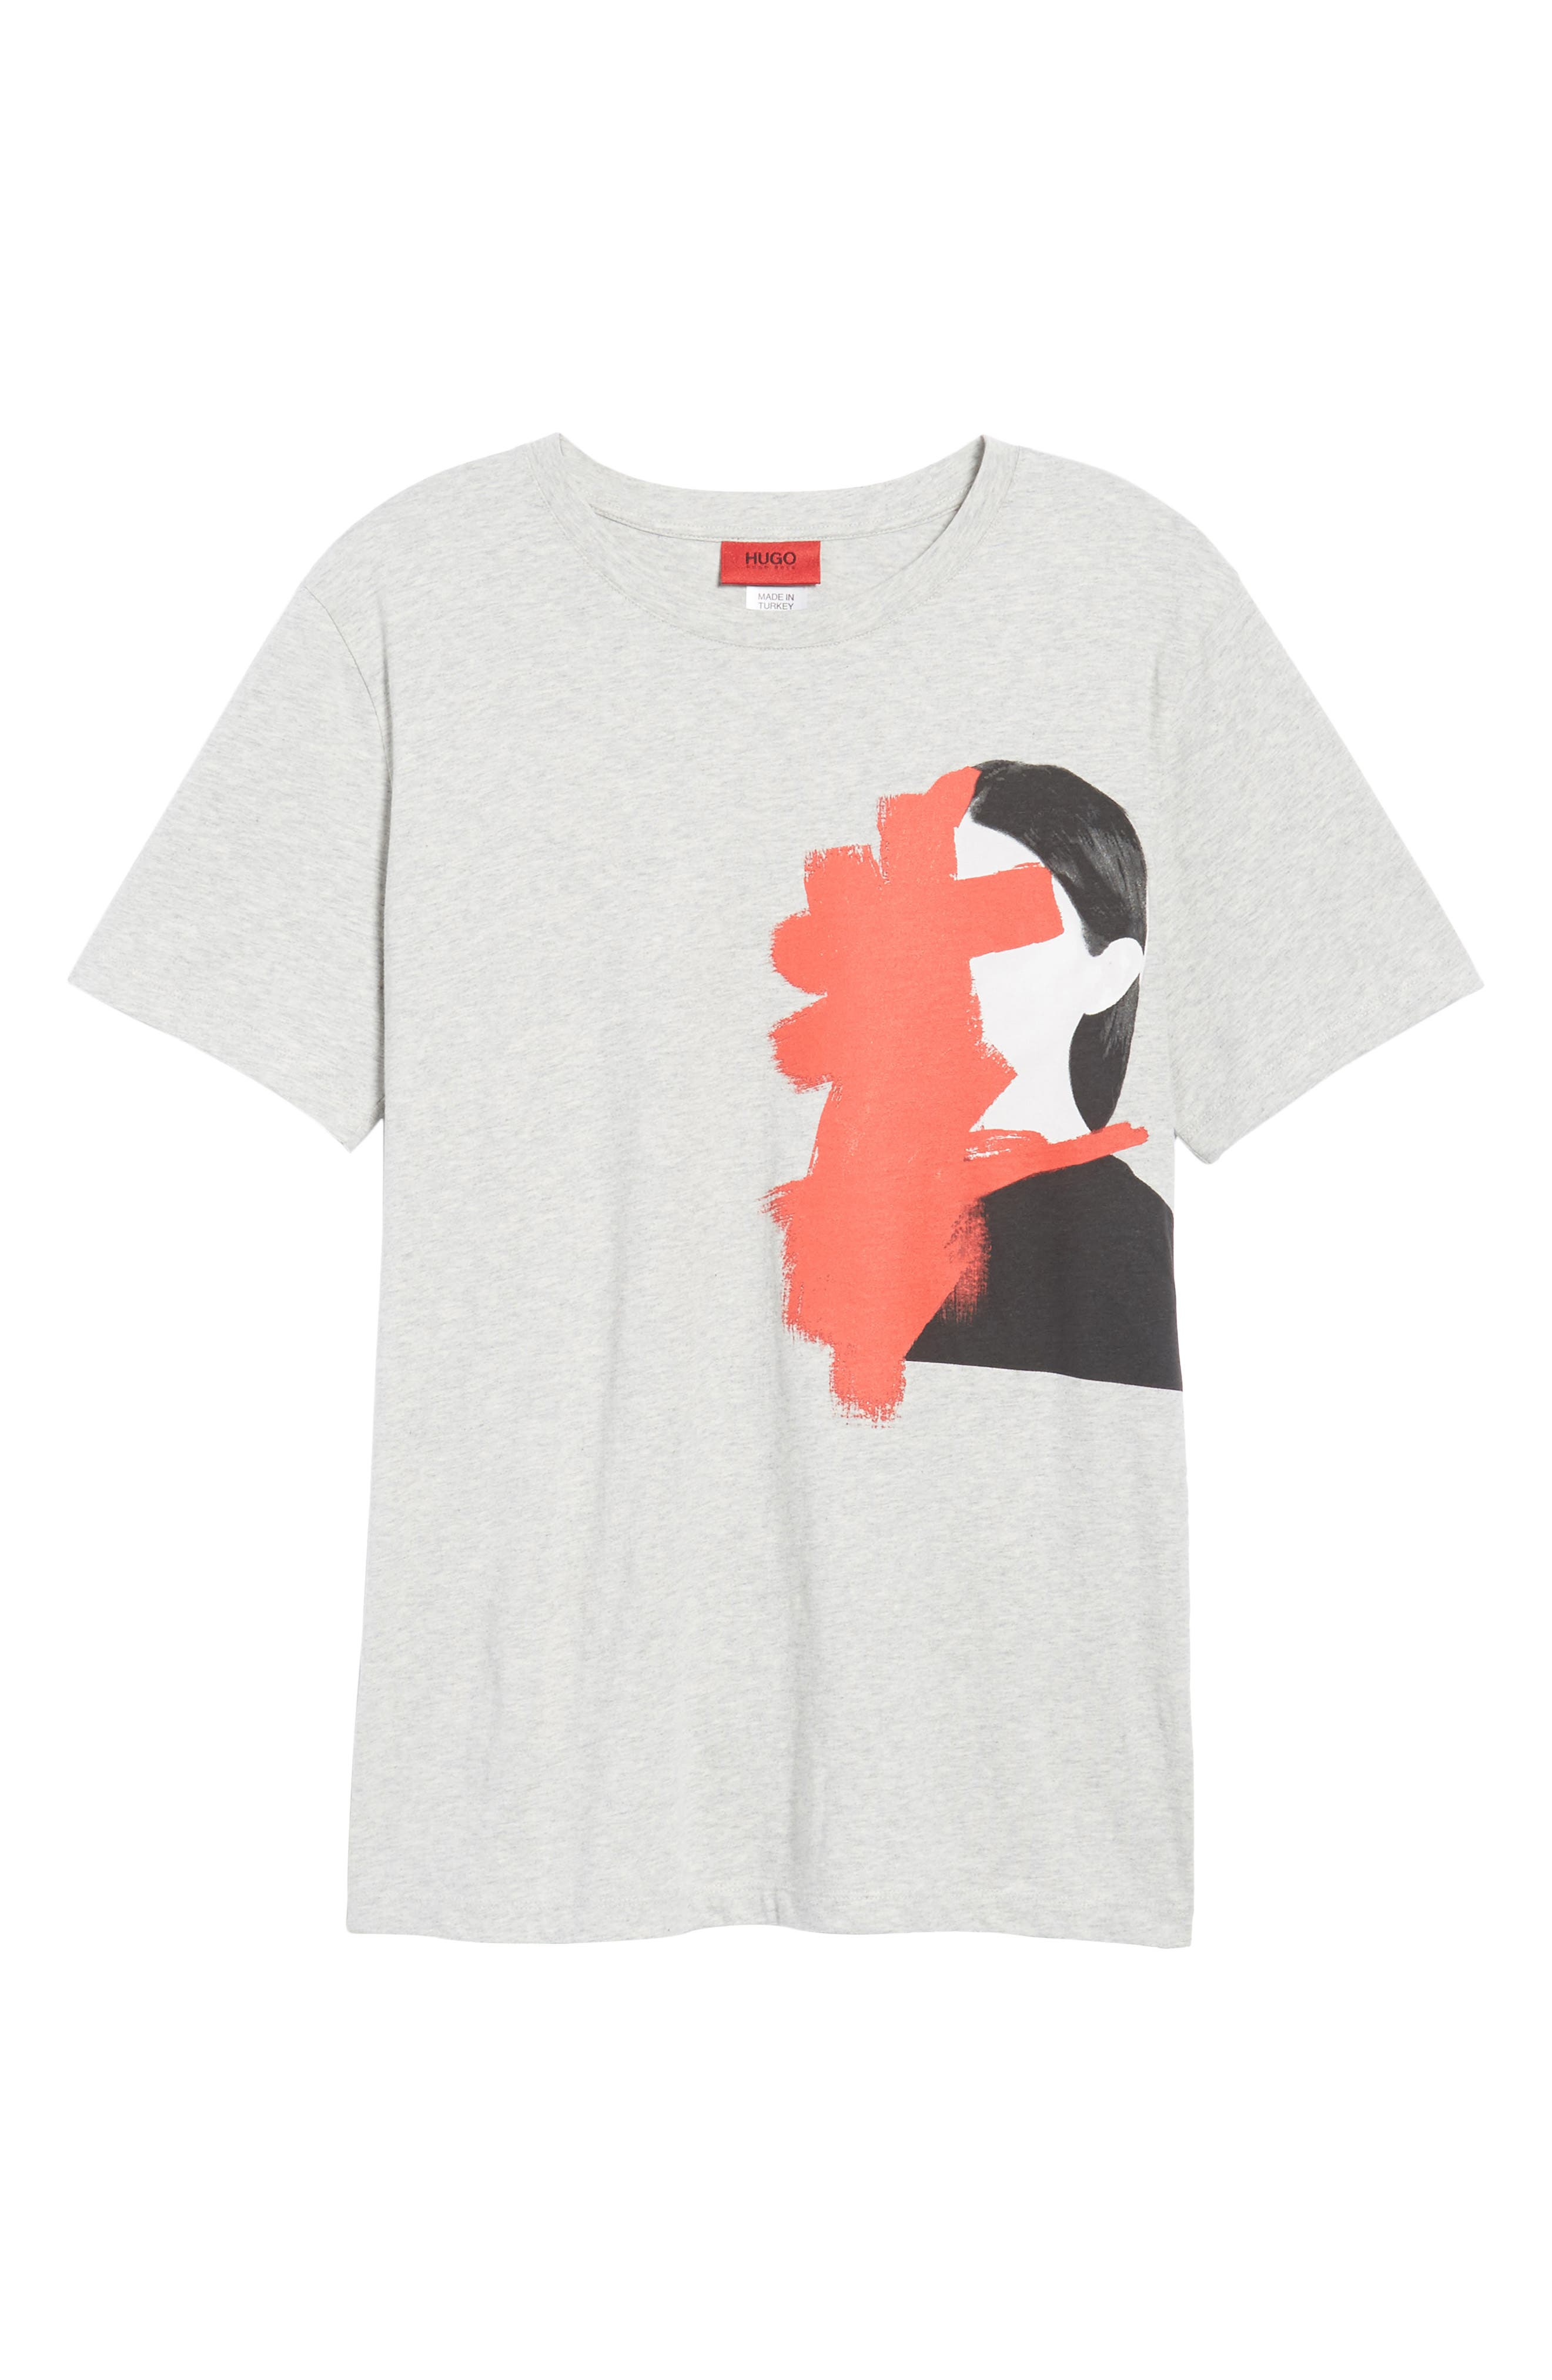 Drush Slim Fit Graphic T-Shirt,                             Alternate thumbnail 6, color,                             061